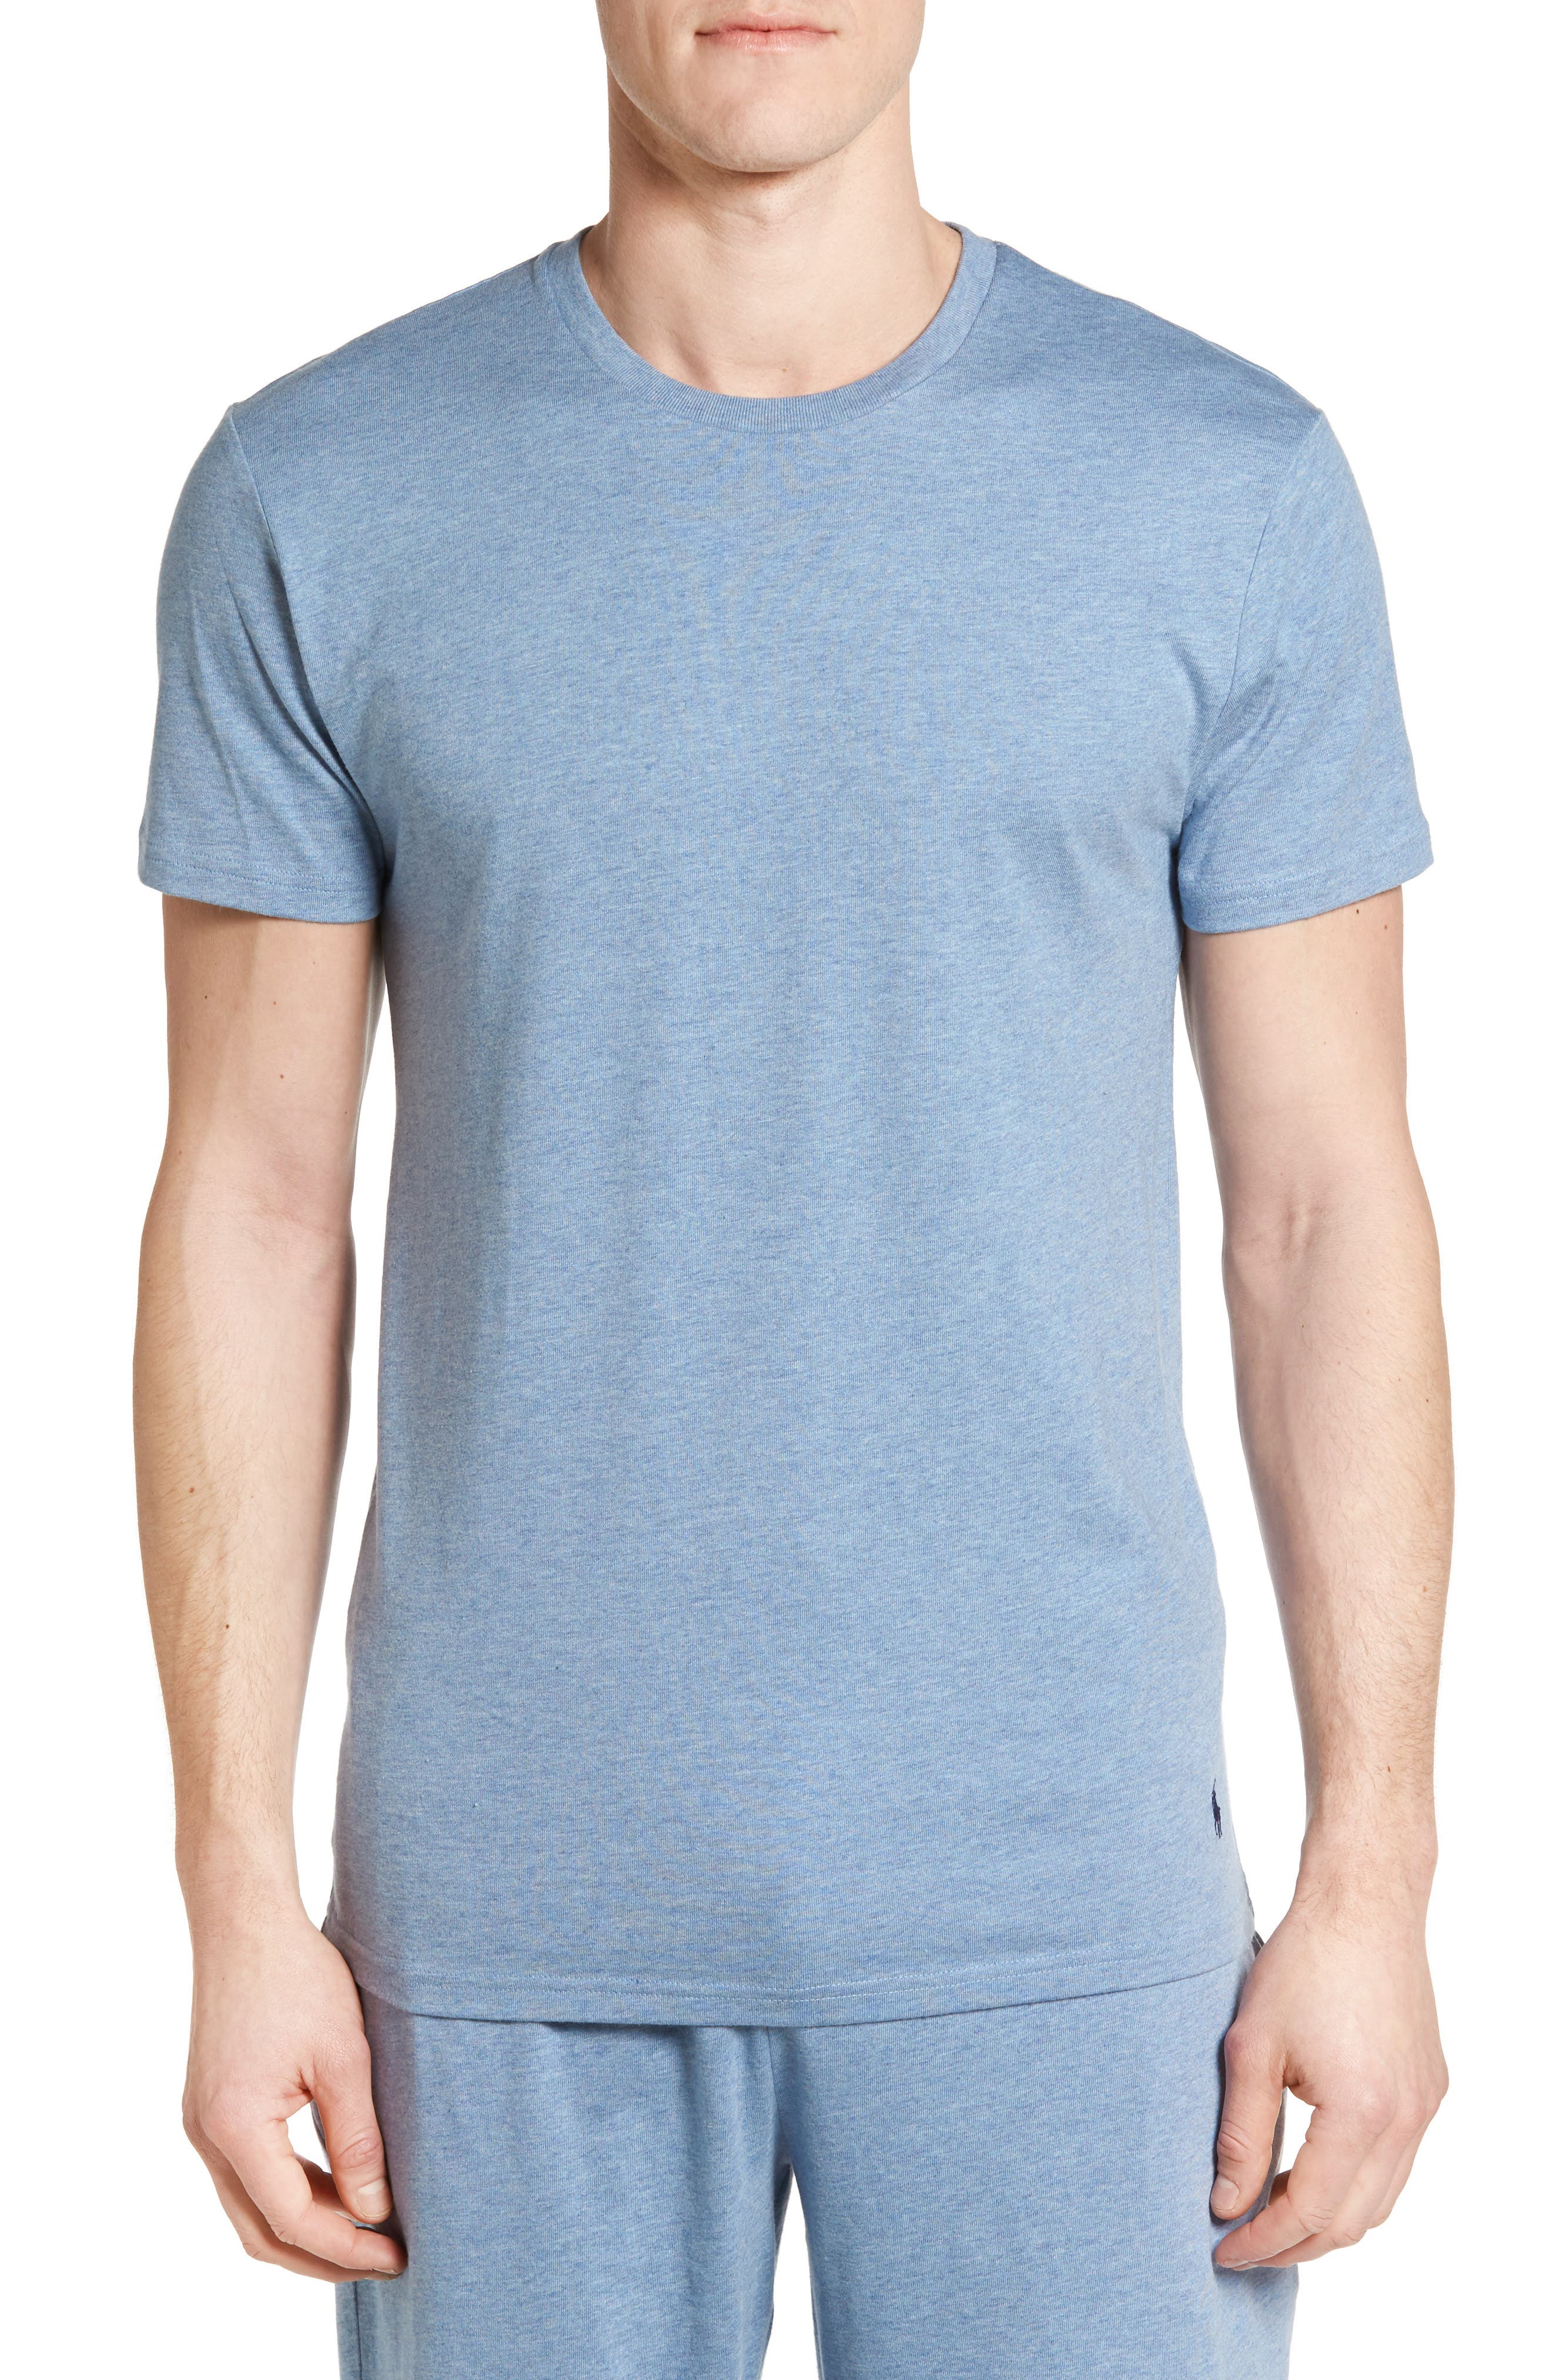 Alternate Image 1 Selected - Polo Ralph Lauren Crewneck Cotton & Modal T-Shirt